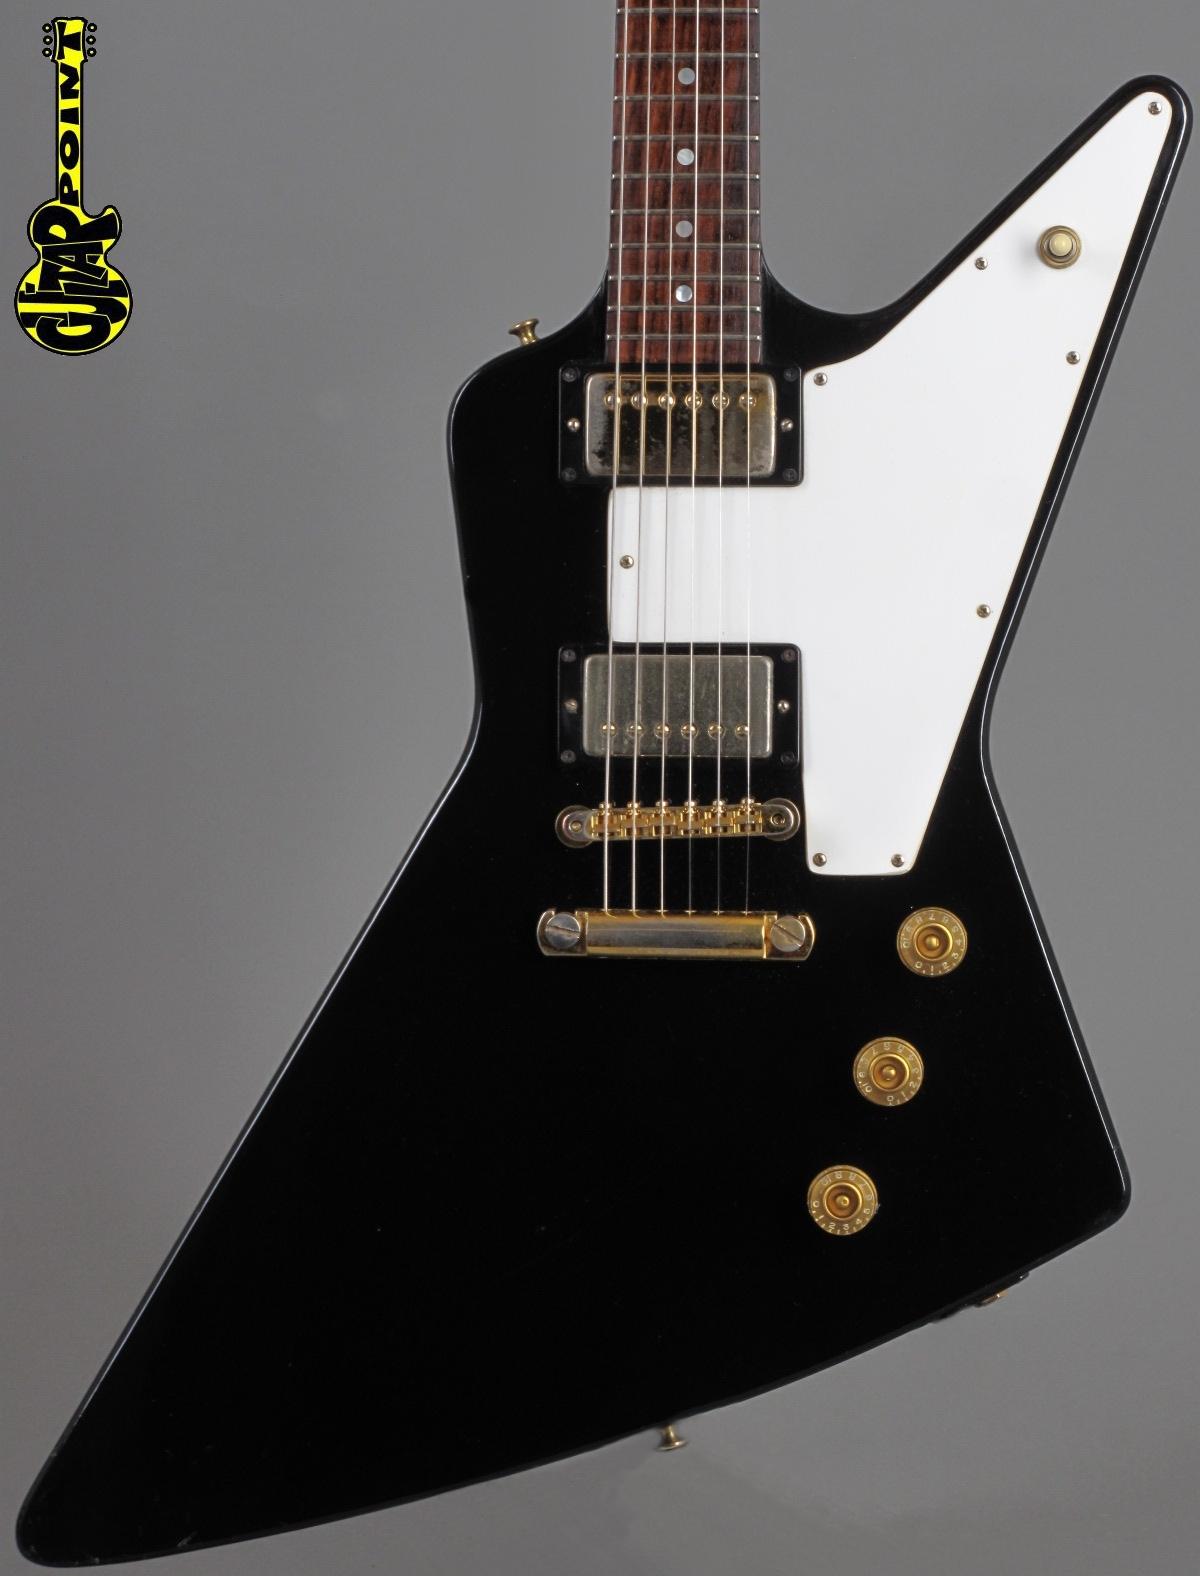 1976 Gibson Explorer - Ebony